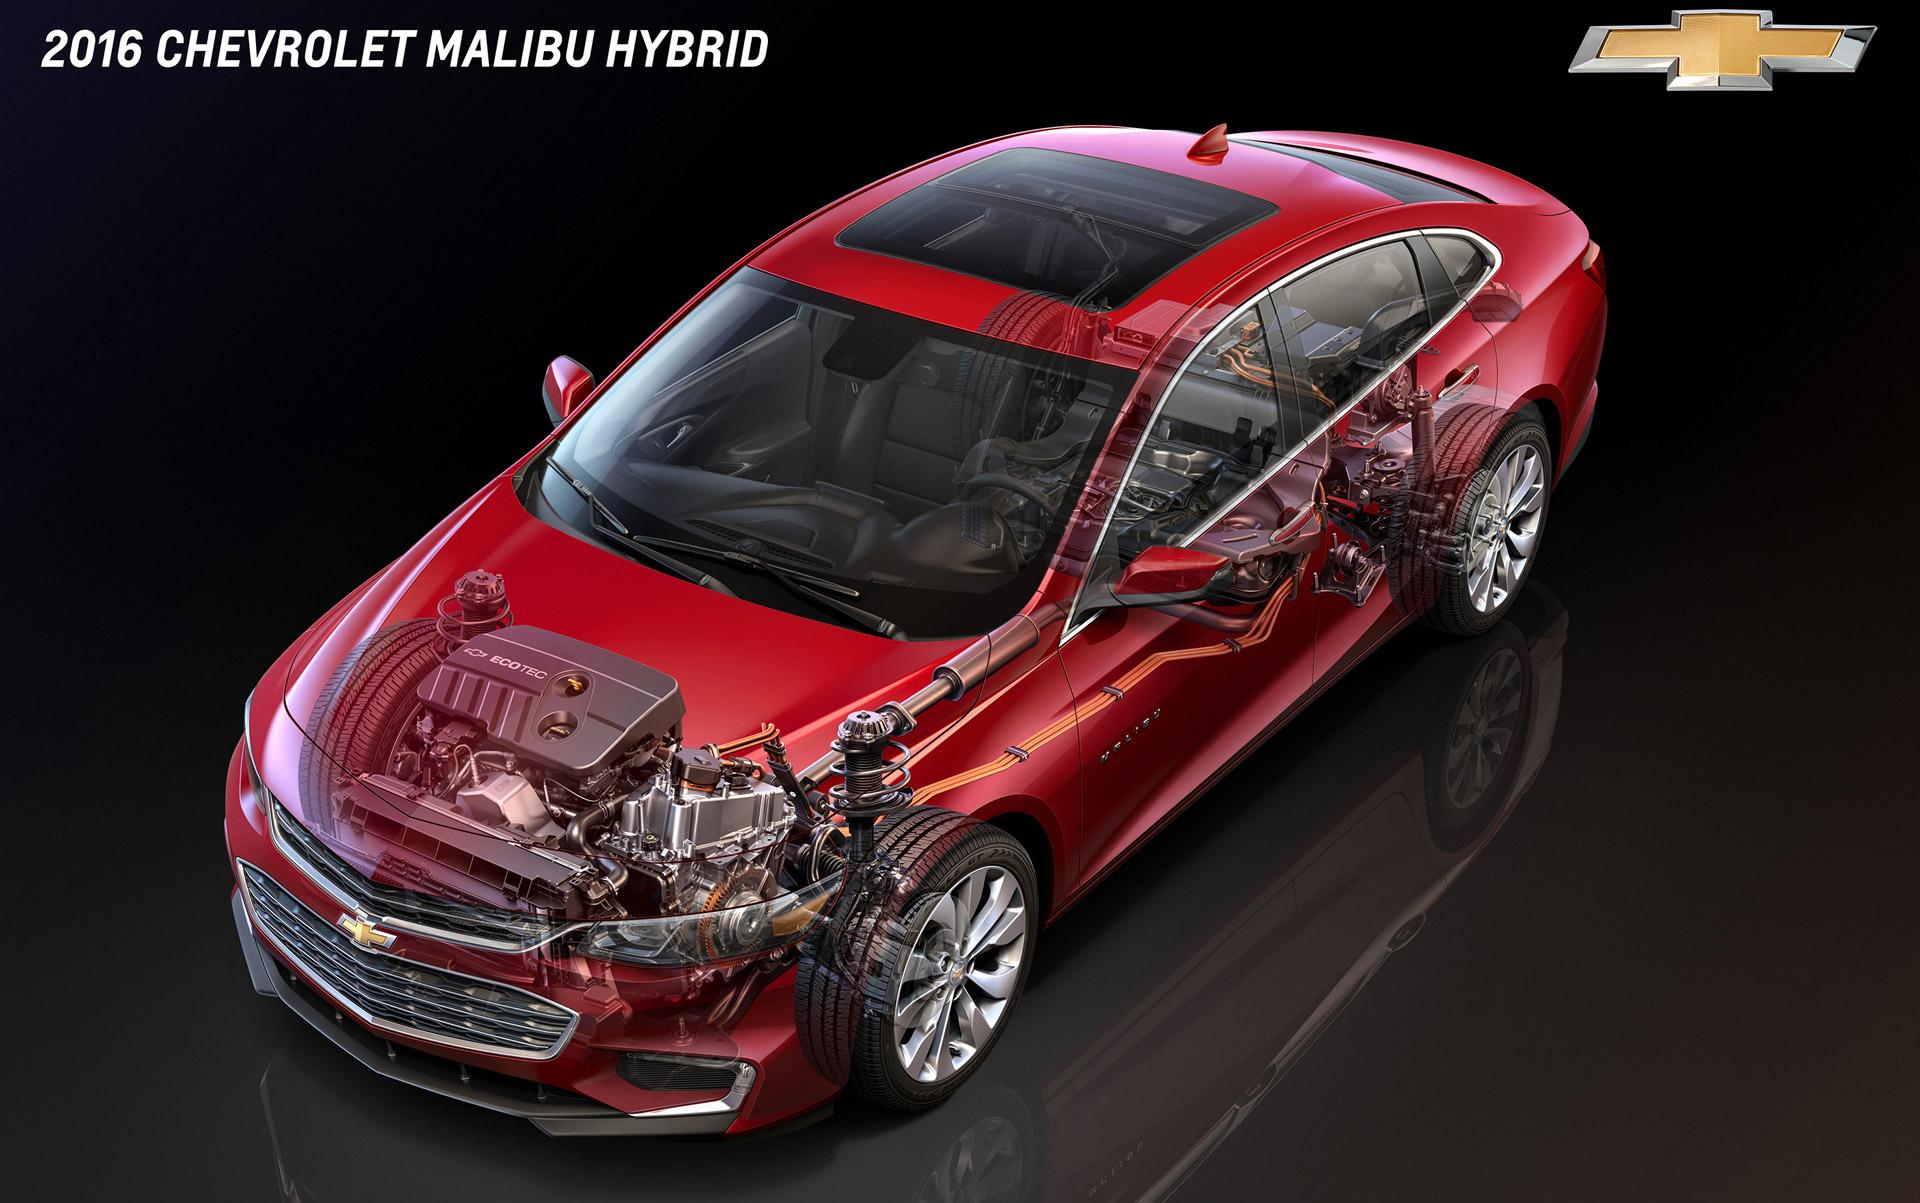 How Similar Are Chevy Volt & Malibu Hybrid Powertrains Very Much